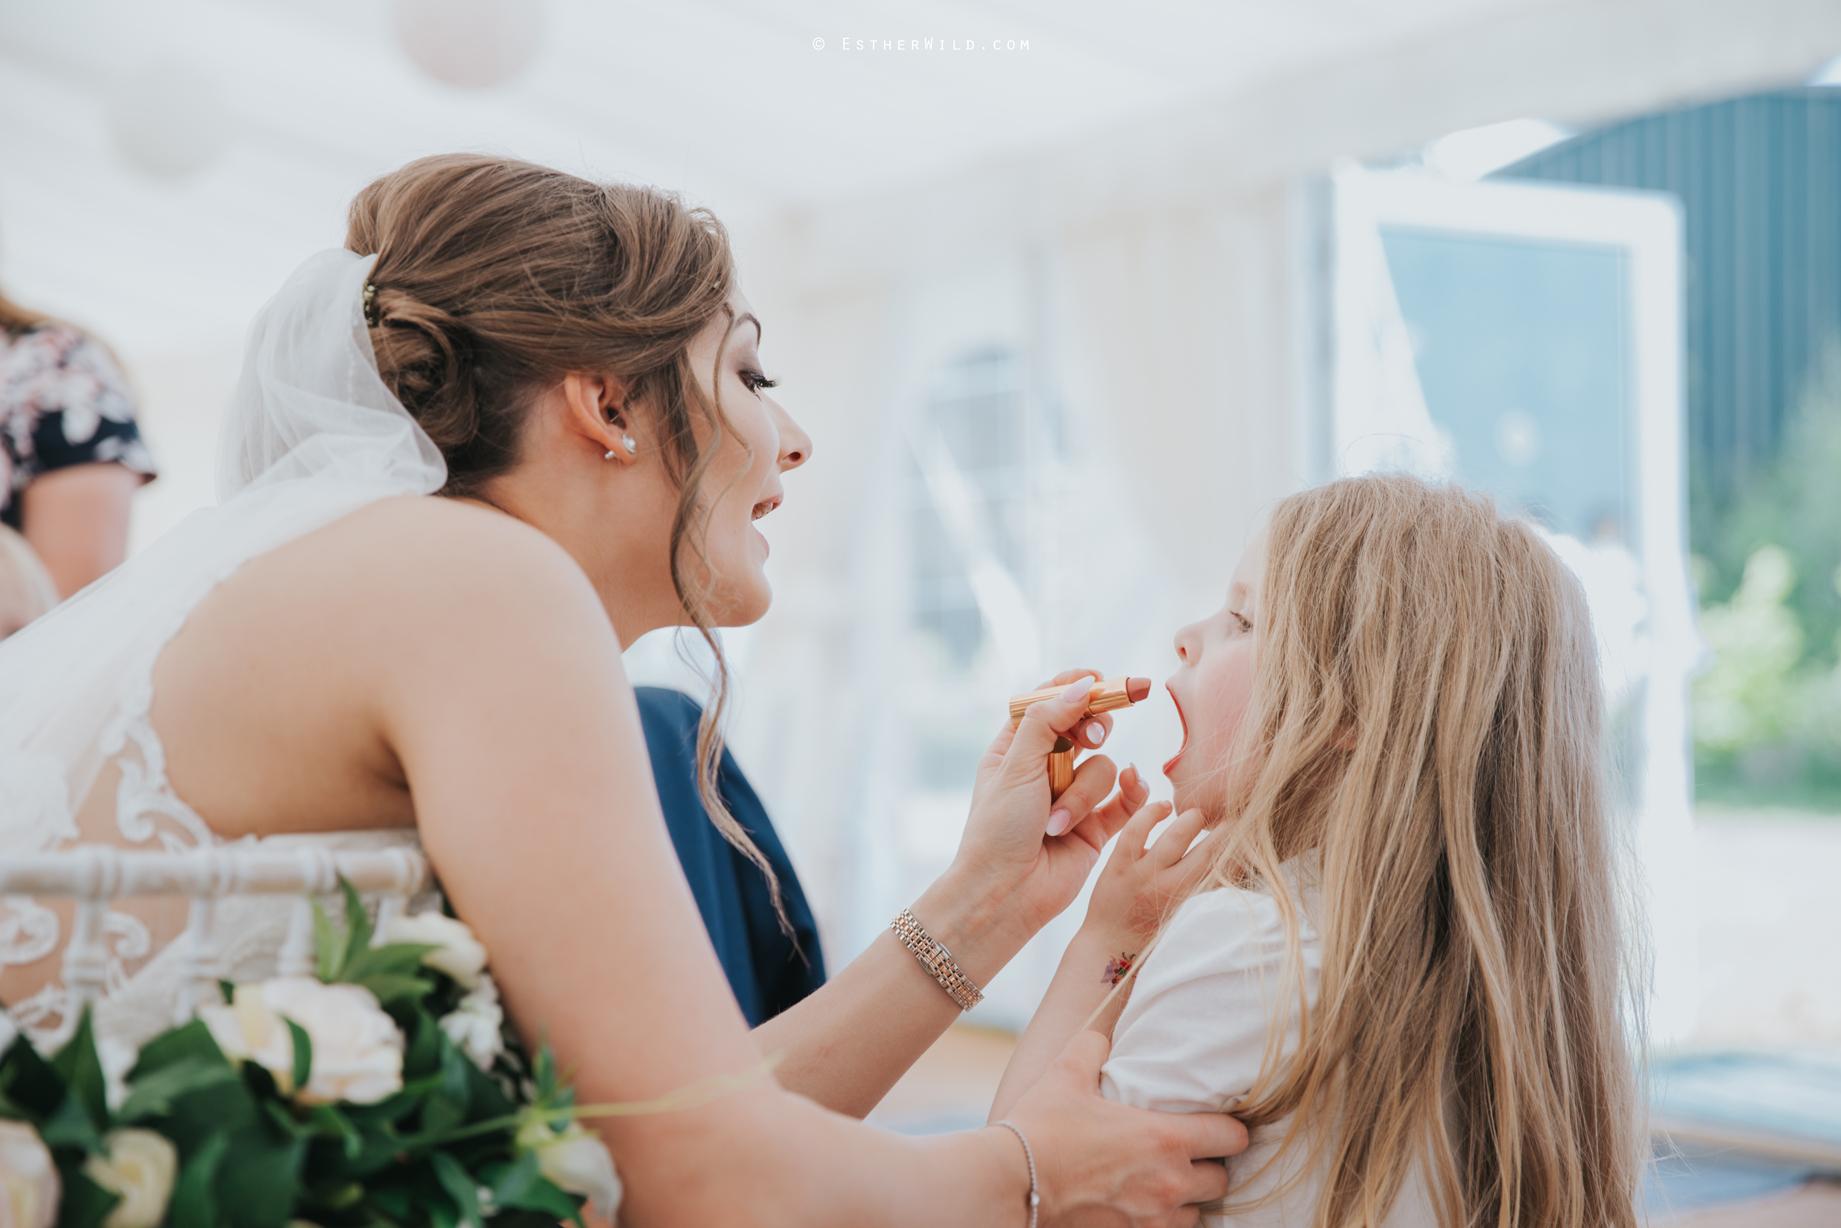 IMG_1677Walpole_St_Andrew_Church_Norfolk_Wedding_Copyright_Esther_Wild_Photographer_.jpg